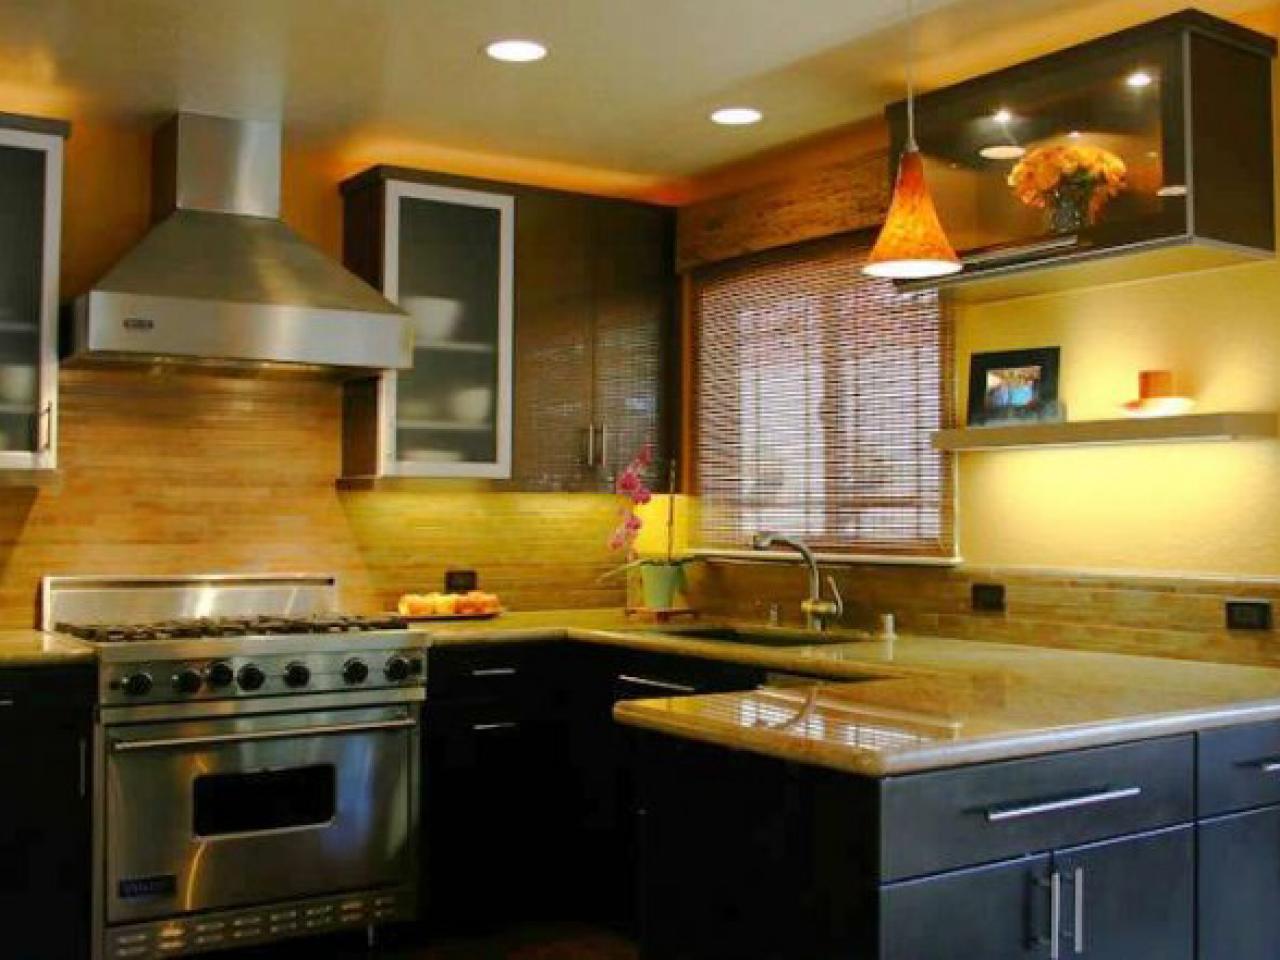 hgtv-grøn-living_blue-blomme-Hoca-kitchen_s4x3-jpg-rend-hgtvcom-1280-960